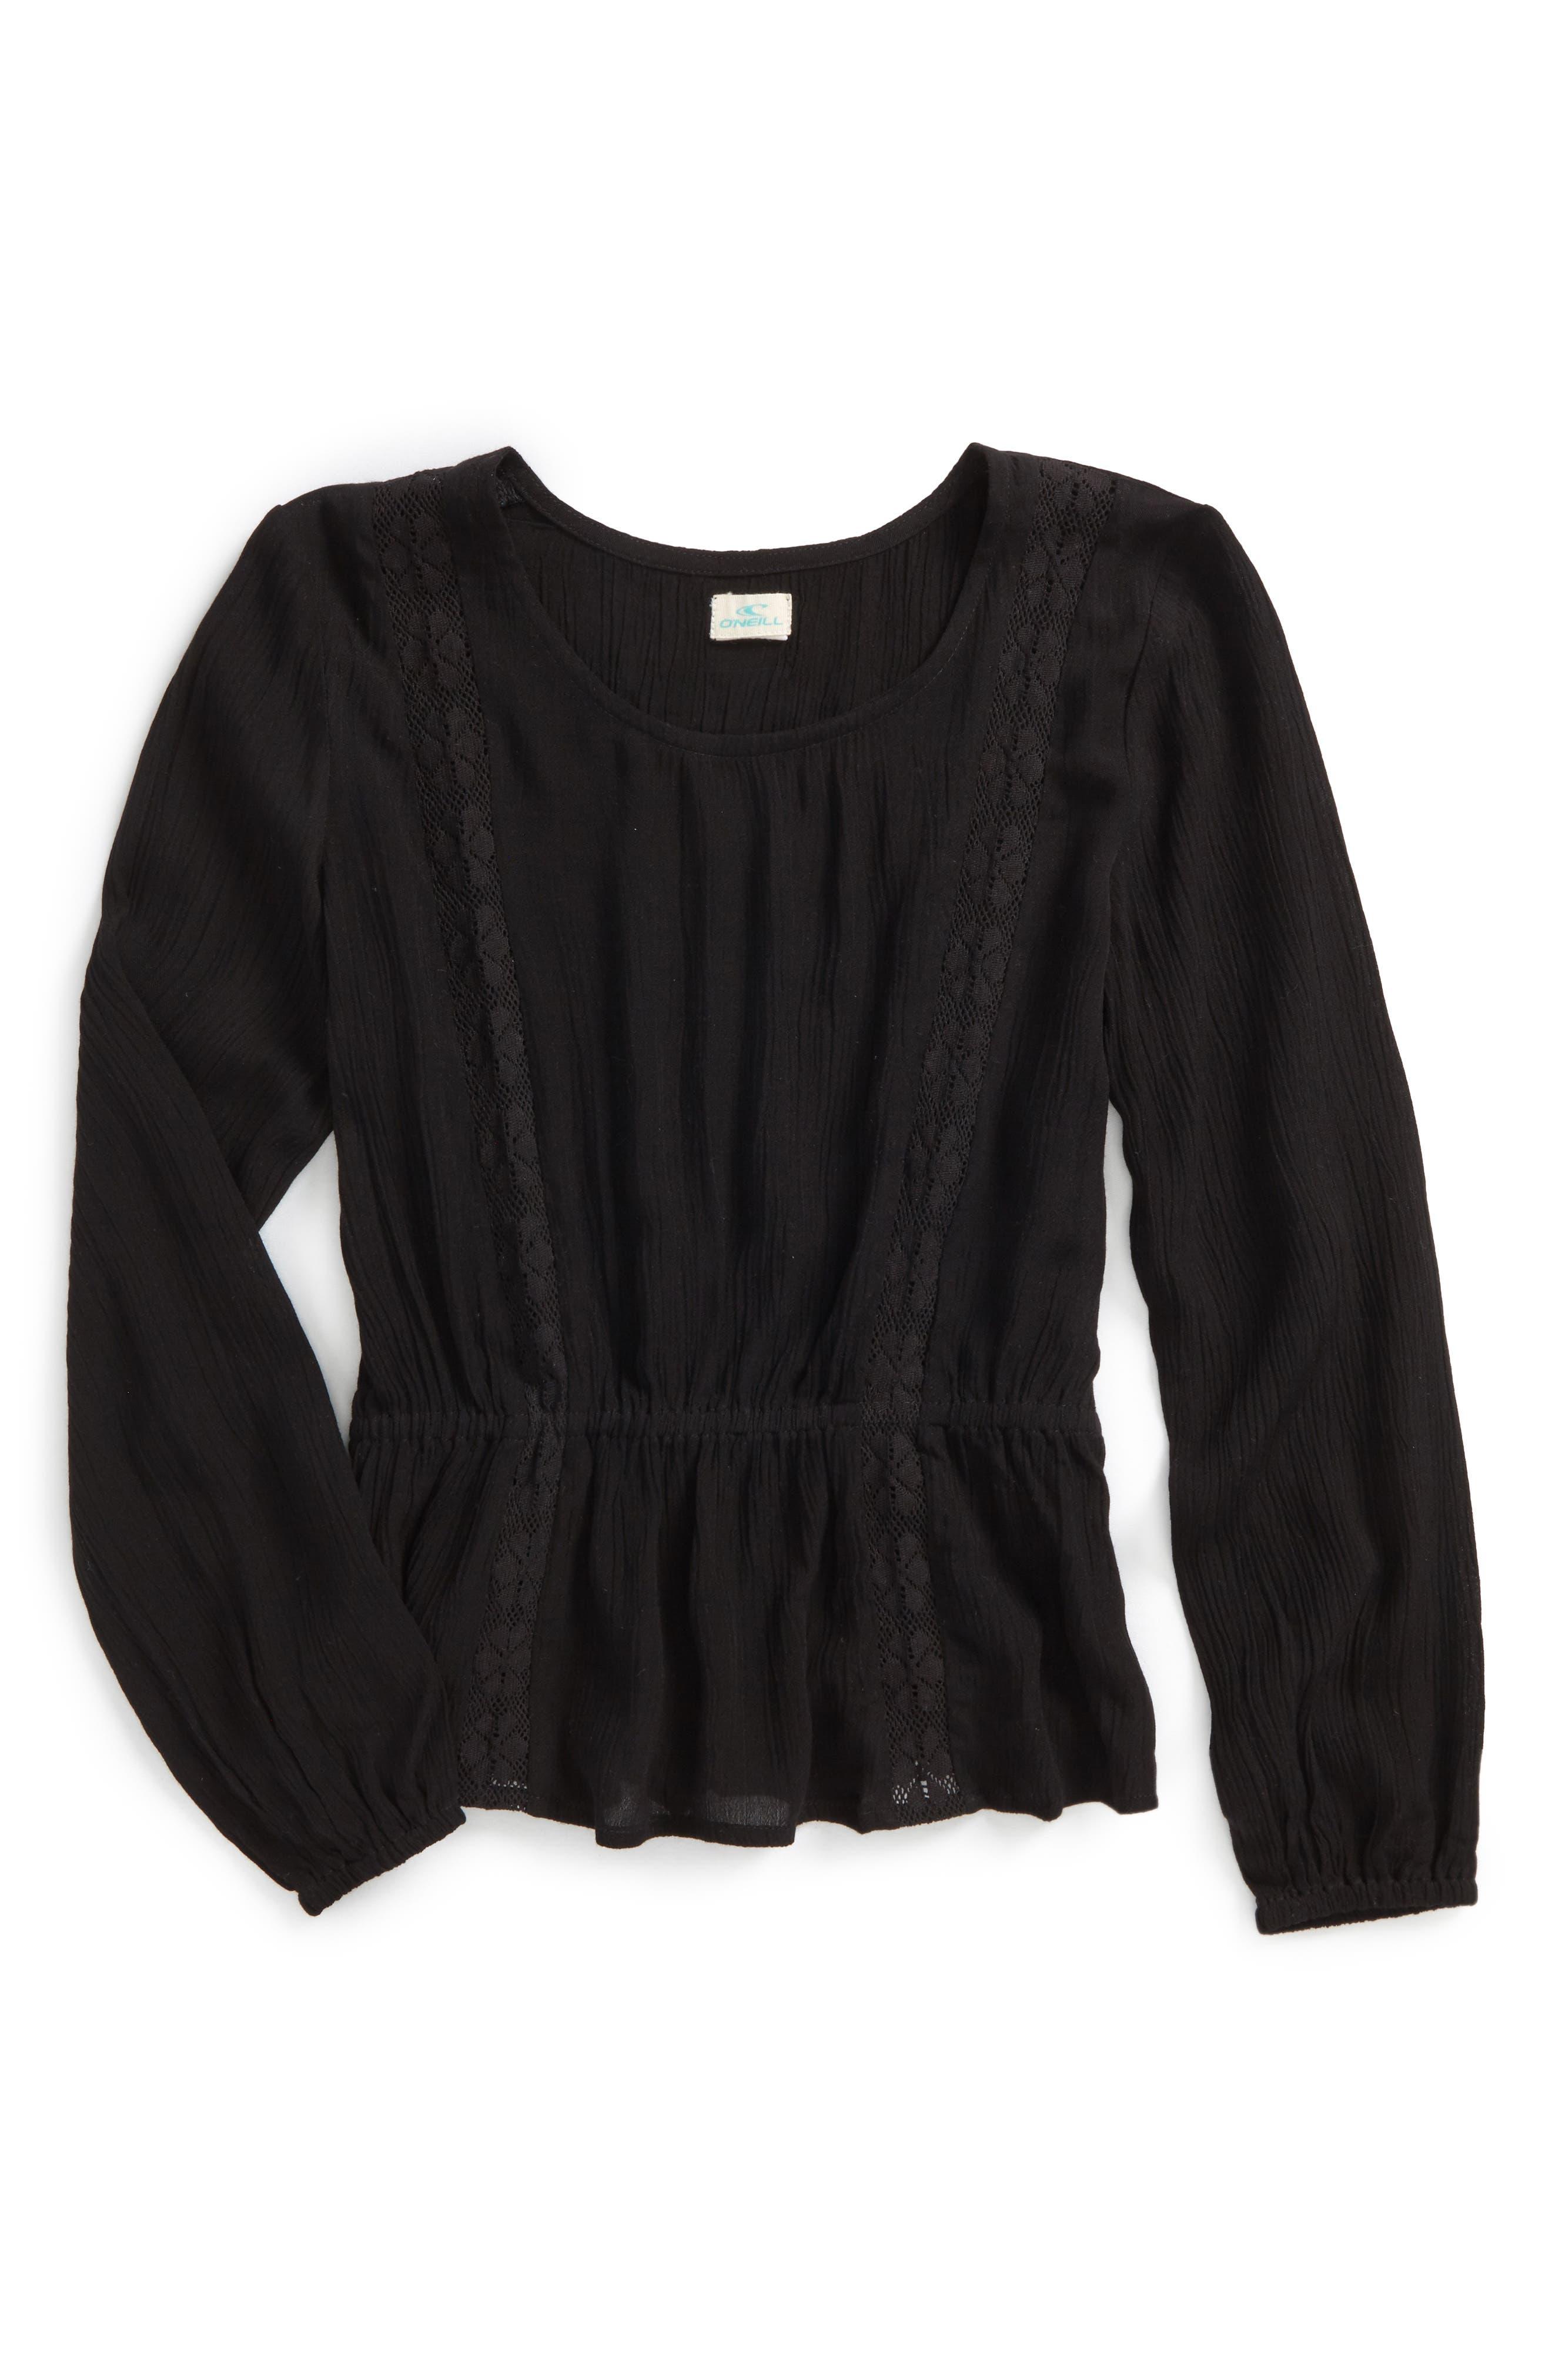 O'NEILL Woven Long Sleeve Top, Main, color, 001